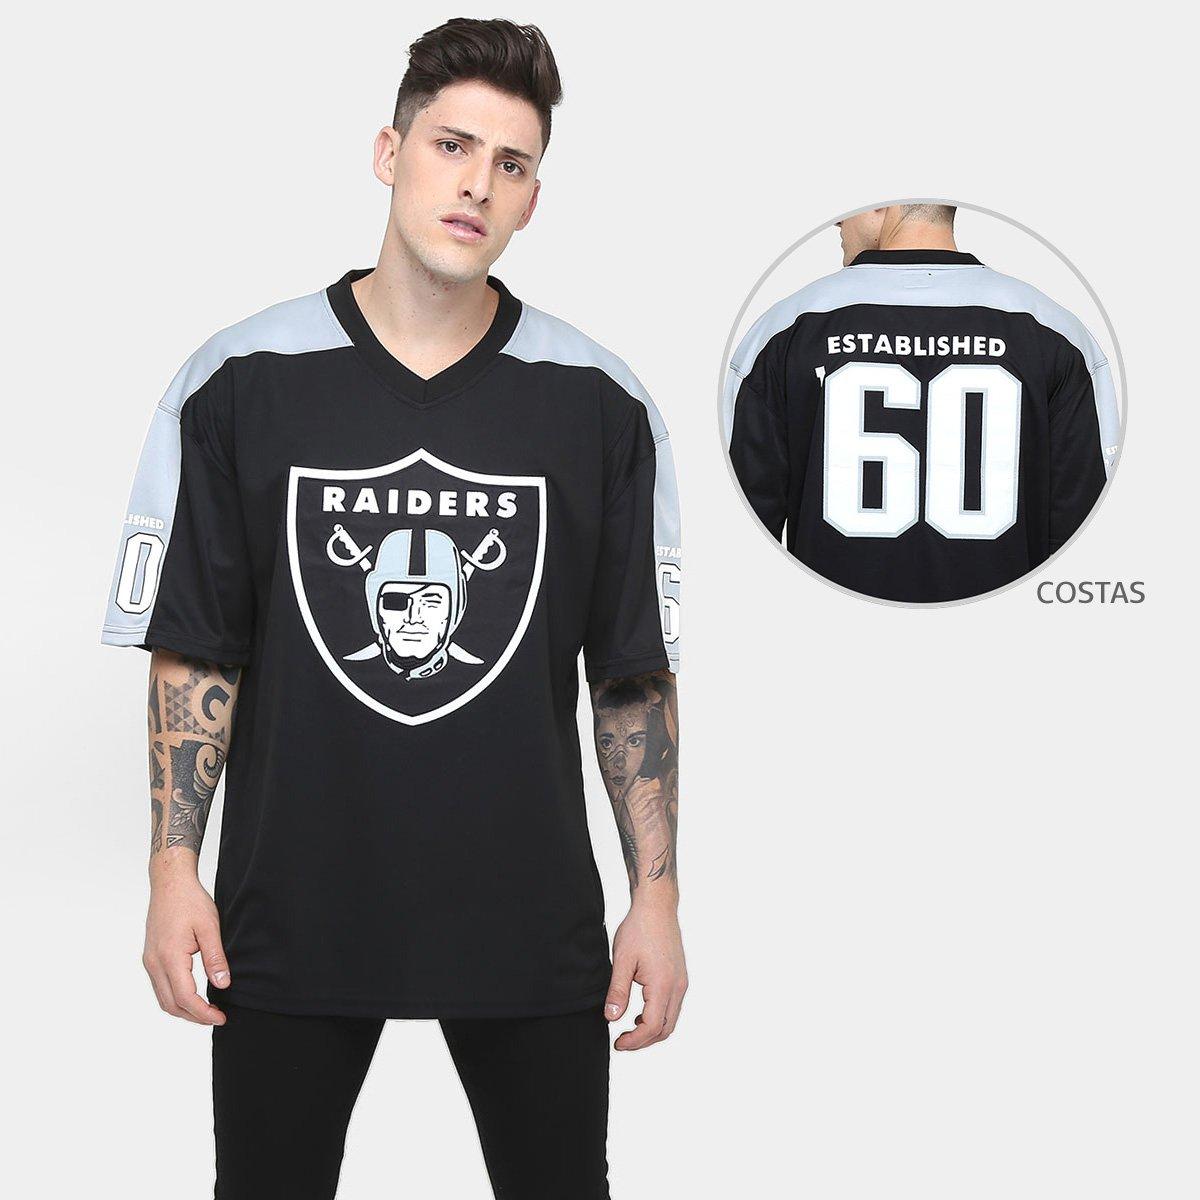 6b2242c59cc81 ... uk o produto camiseta new era especial jersey raiders preto acabou.  cc04f 98db7